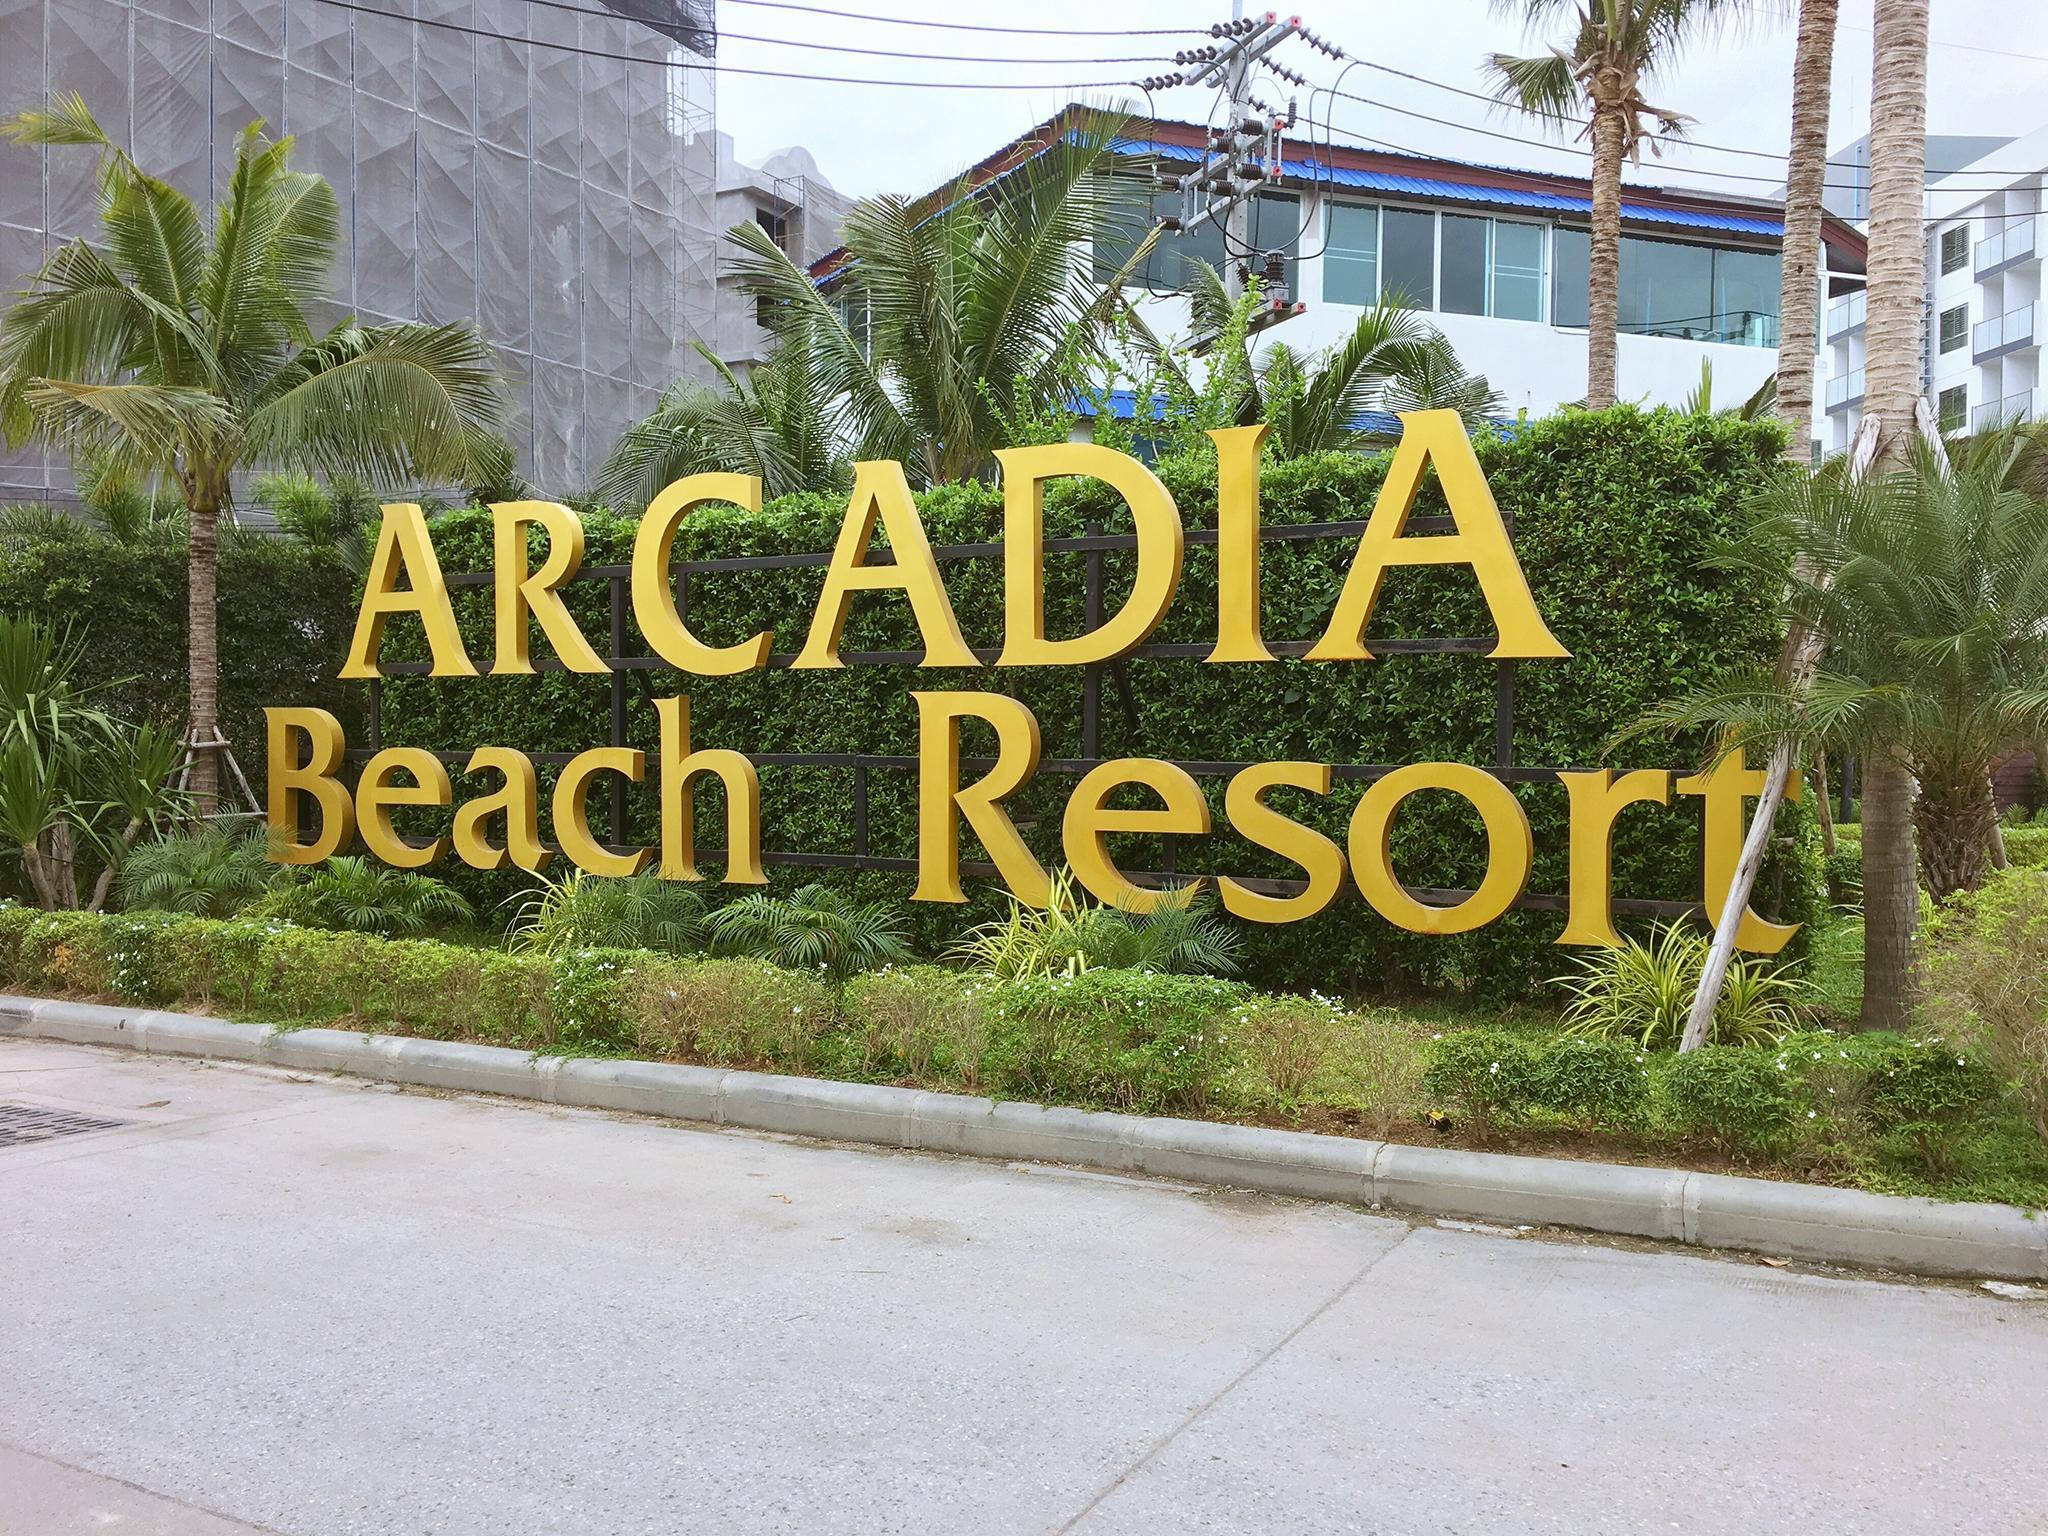 First Lease, Arcadia Beach Resort,New&Clean,First Lease, Arcadia Beach Resort,New&Clean